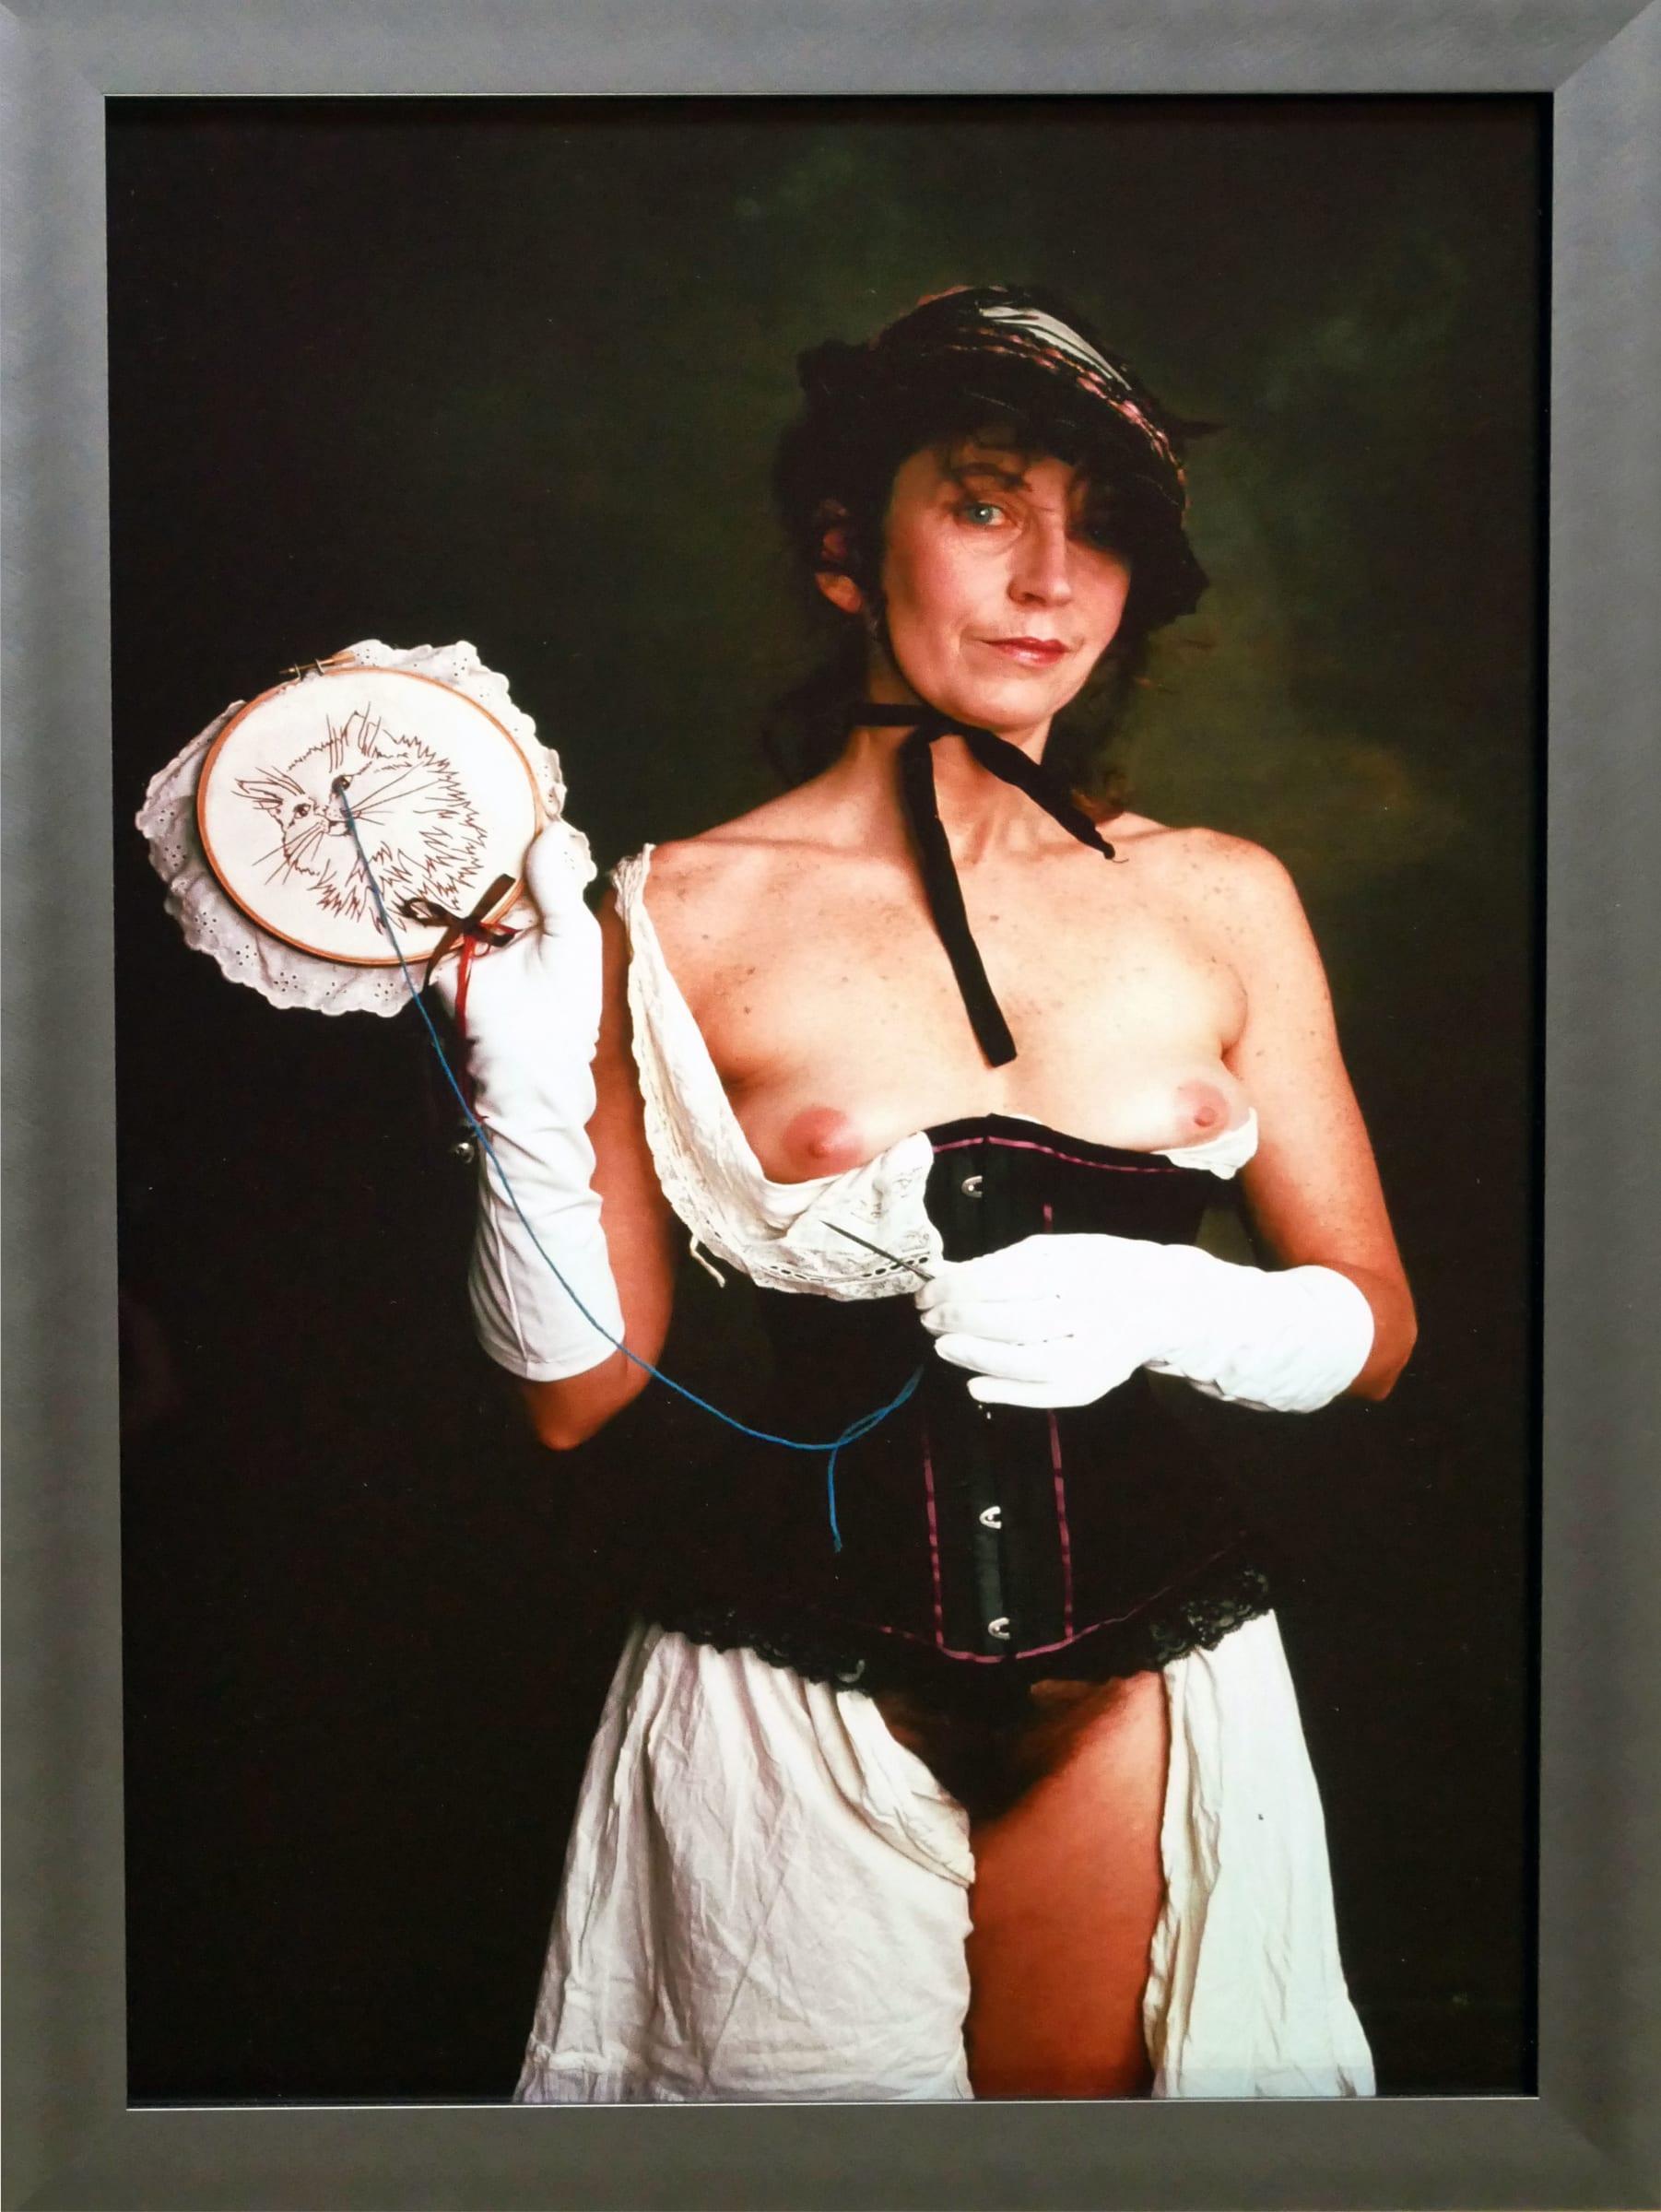 "<span class=""link fancybox-details-link""><a href=""/artists/113-annie-sprinkle/works/1587/"">View Detail Page</a></span><div class=""artist""><strong>Annie SPRINKLE</strong></div> <div class=""title""><em>15 sluts and goddesses inside Linda Montano</em>, 1998</div> <div class=""medium"">15 cibachrome framed photographs</div> <div class=""dimensions"">40 x 30 cm<br /> 15 3/4 x 11 3/4 in</div> <div class=""edition_details"">Edition of 10</div><div class=""copyright_line"">Copyright the artist </div>"